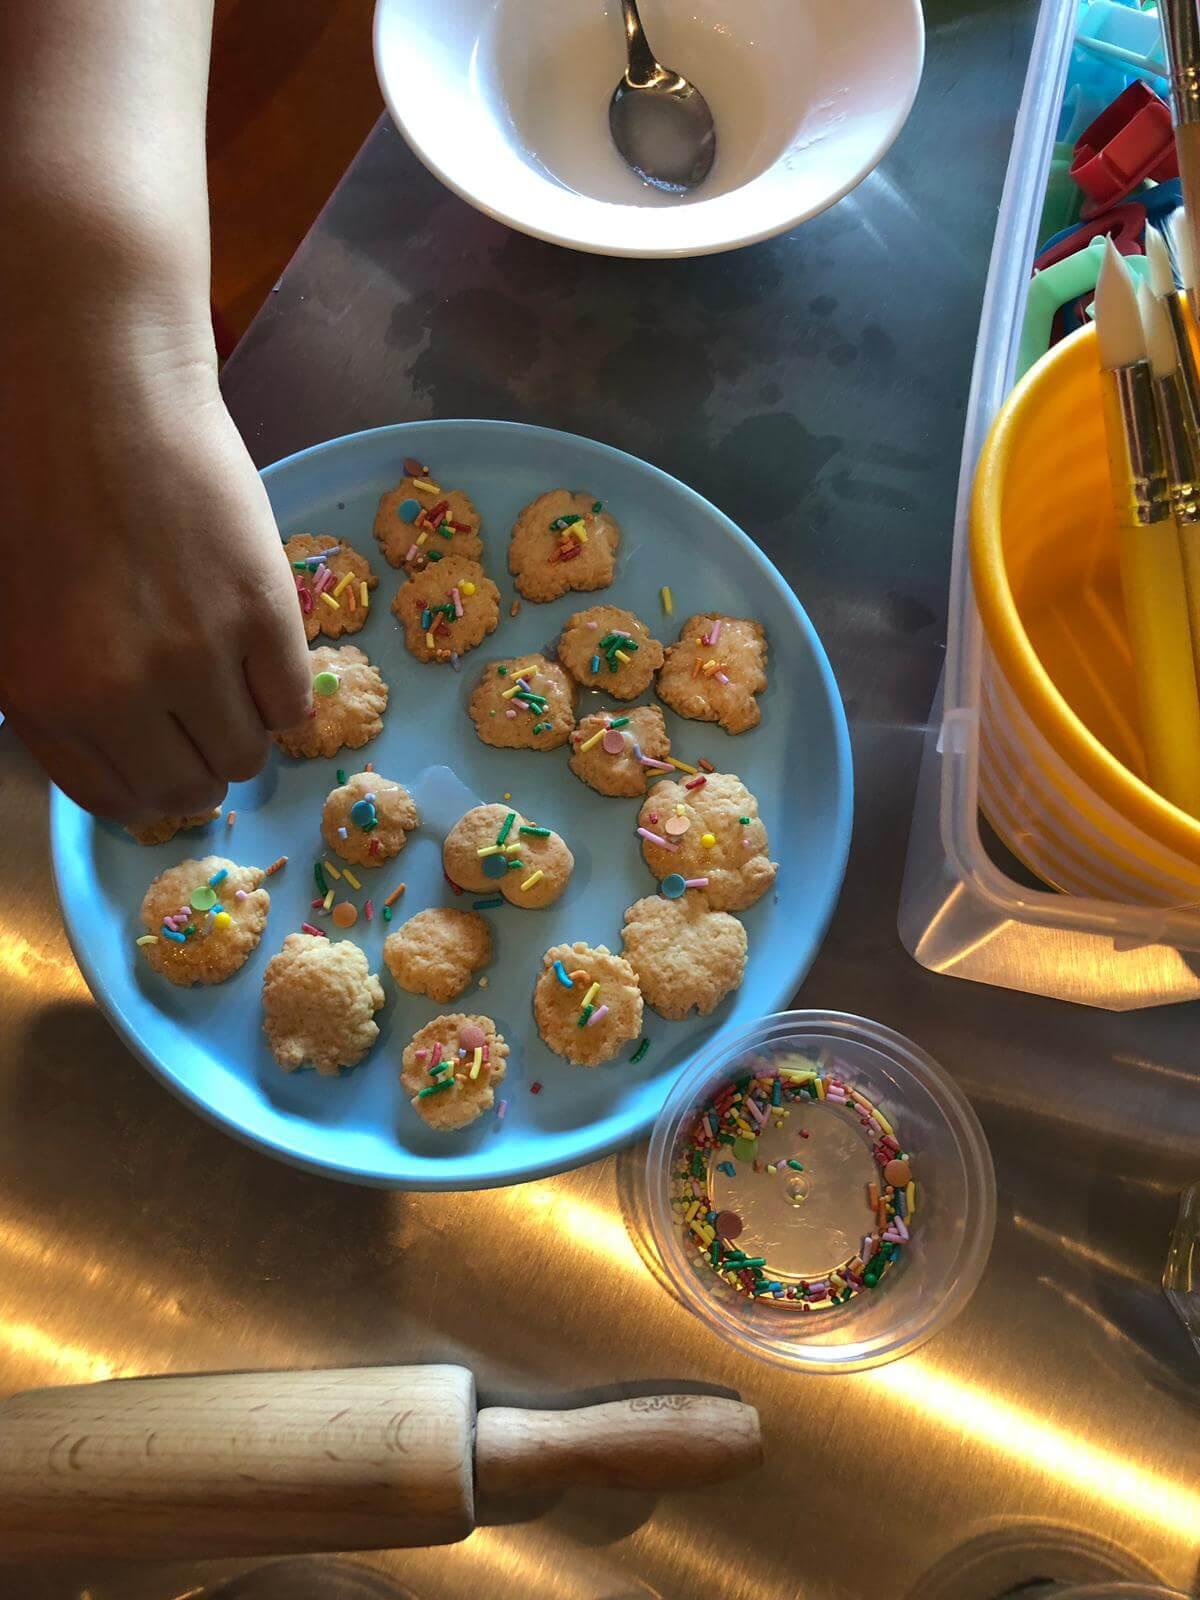 restaurant-feefa-kinderen-koekjes-bakken-3